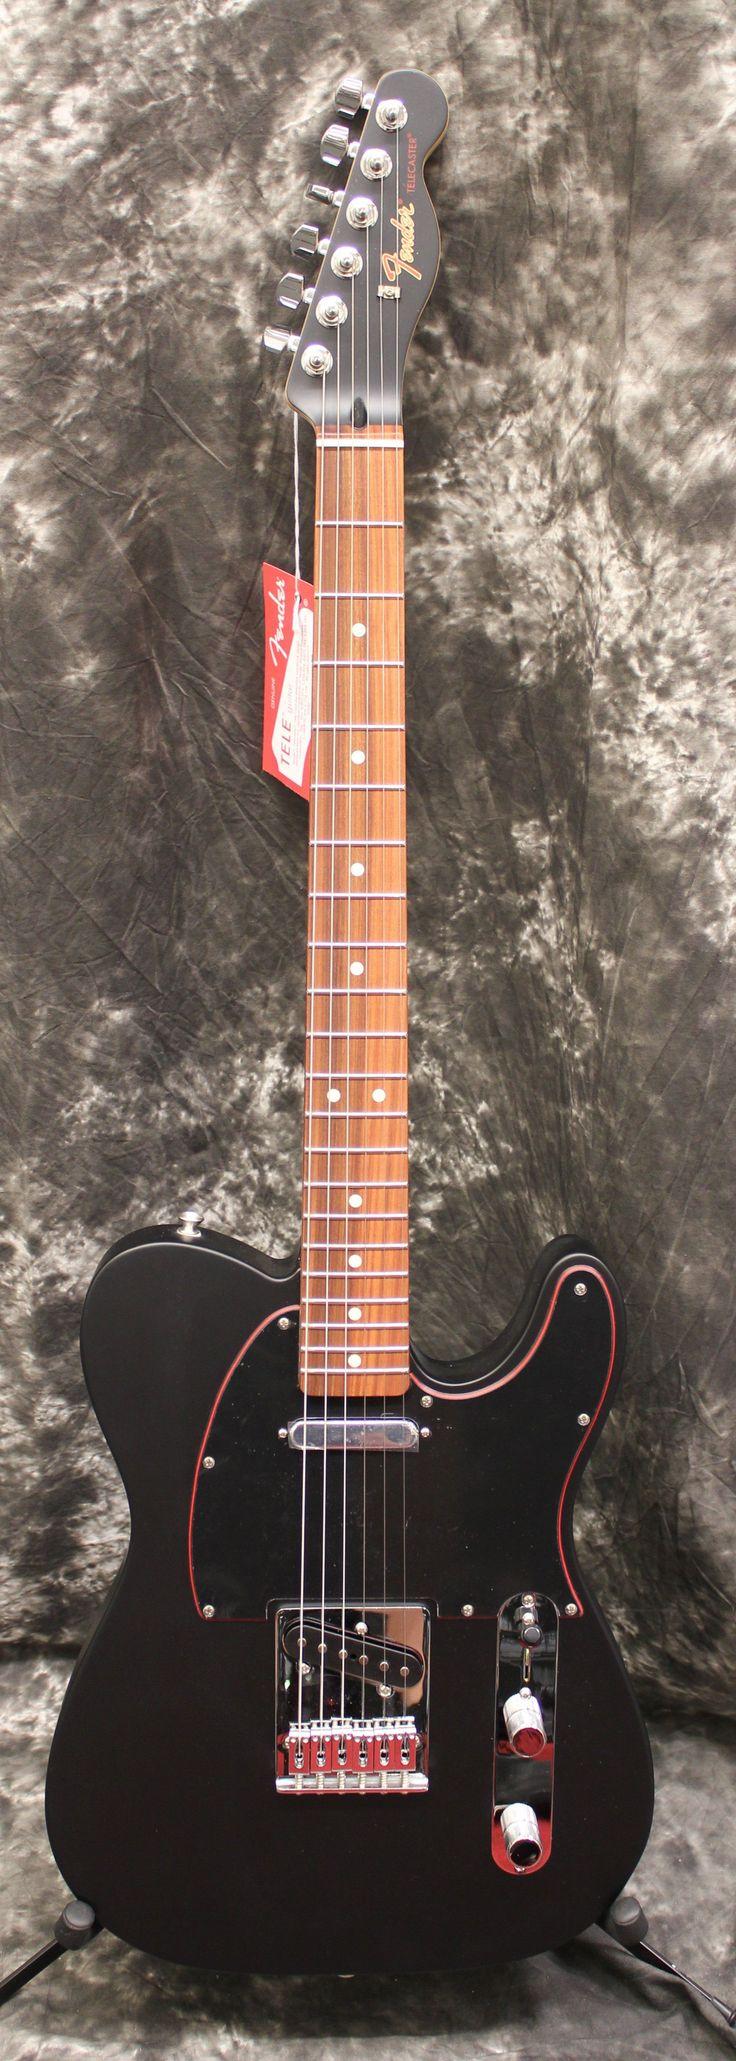 2017 Fender FSR Special Edition Telecaster Noir Satin Black Electric Guitar